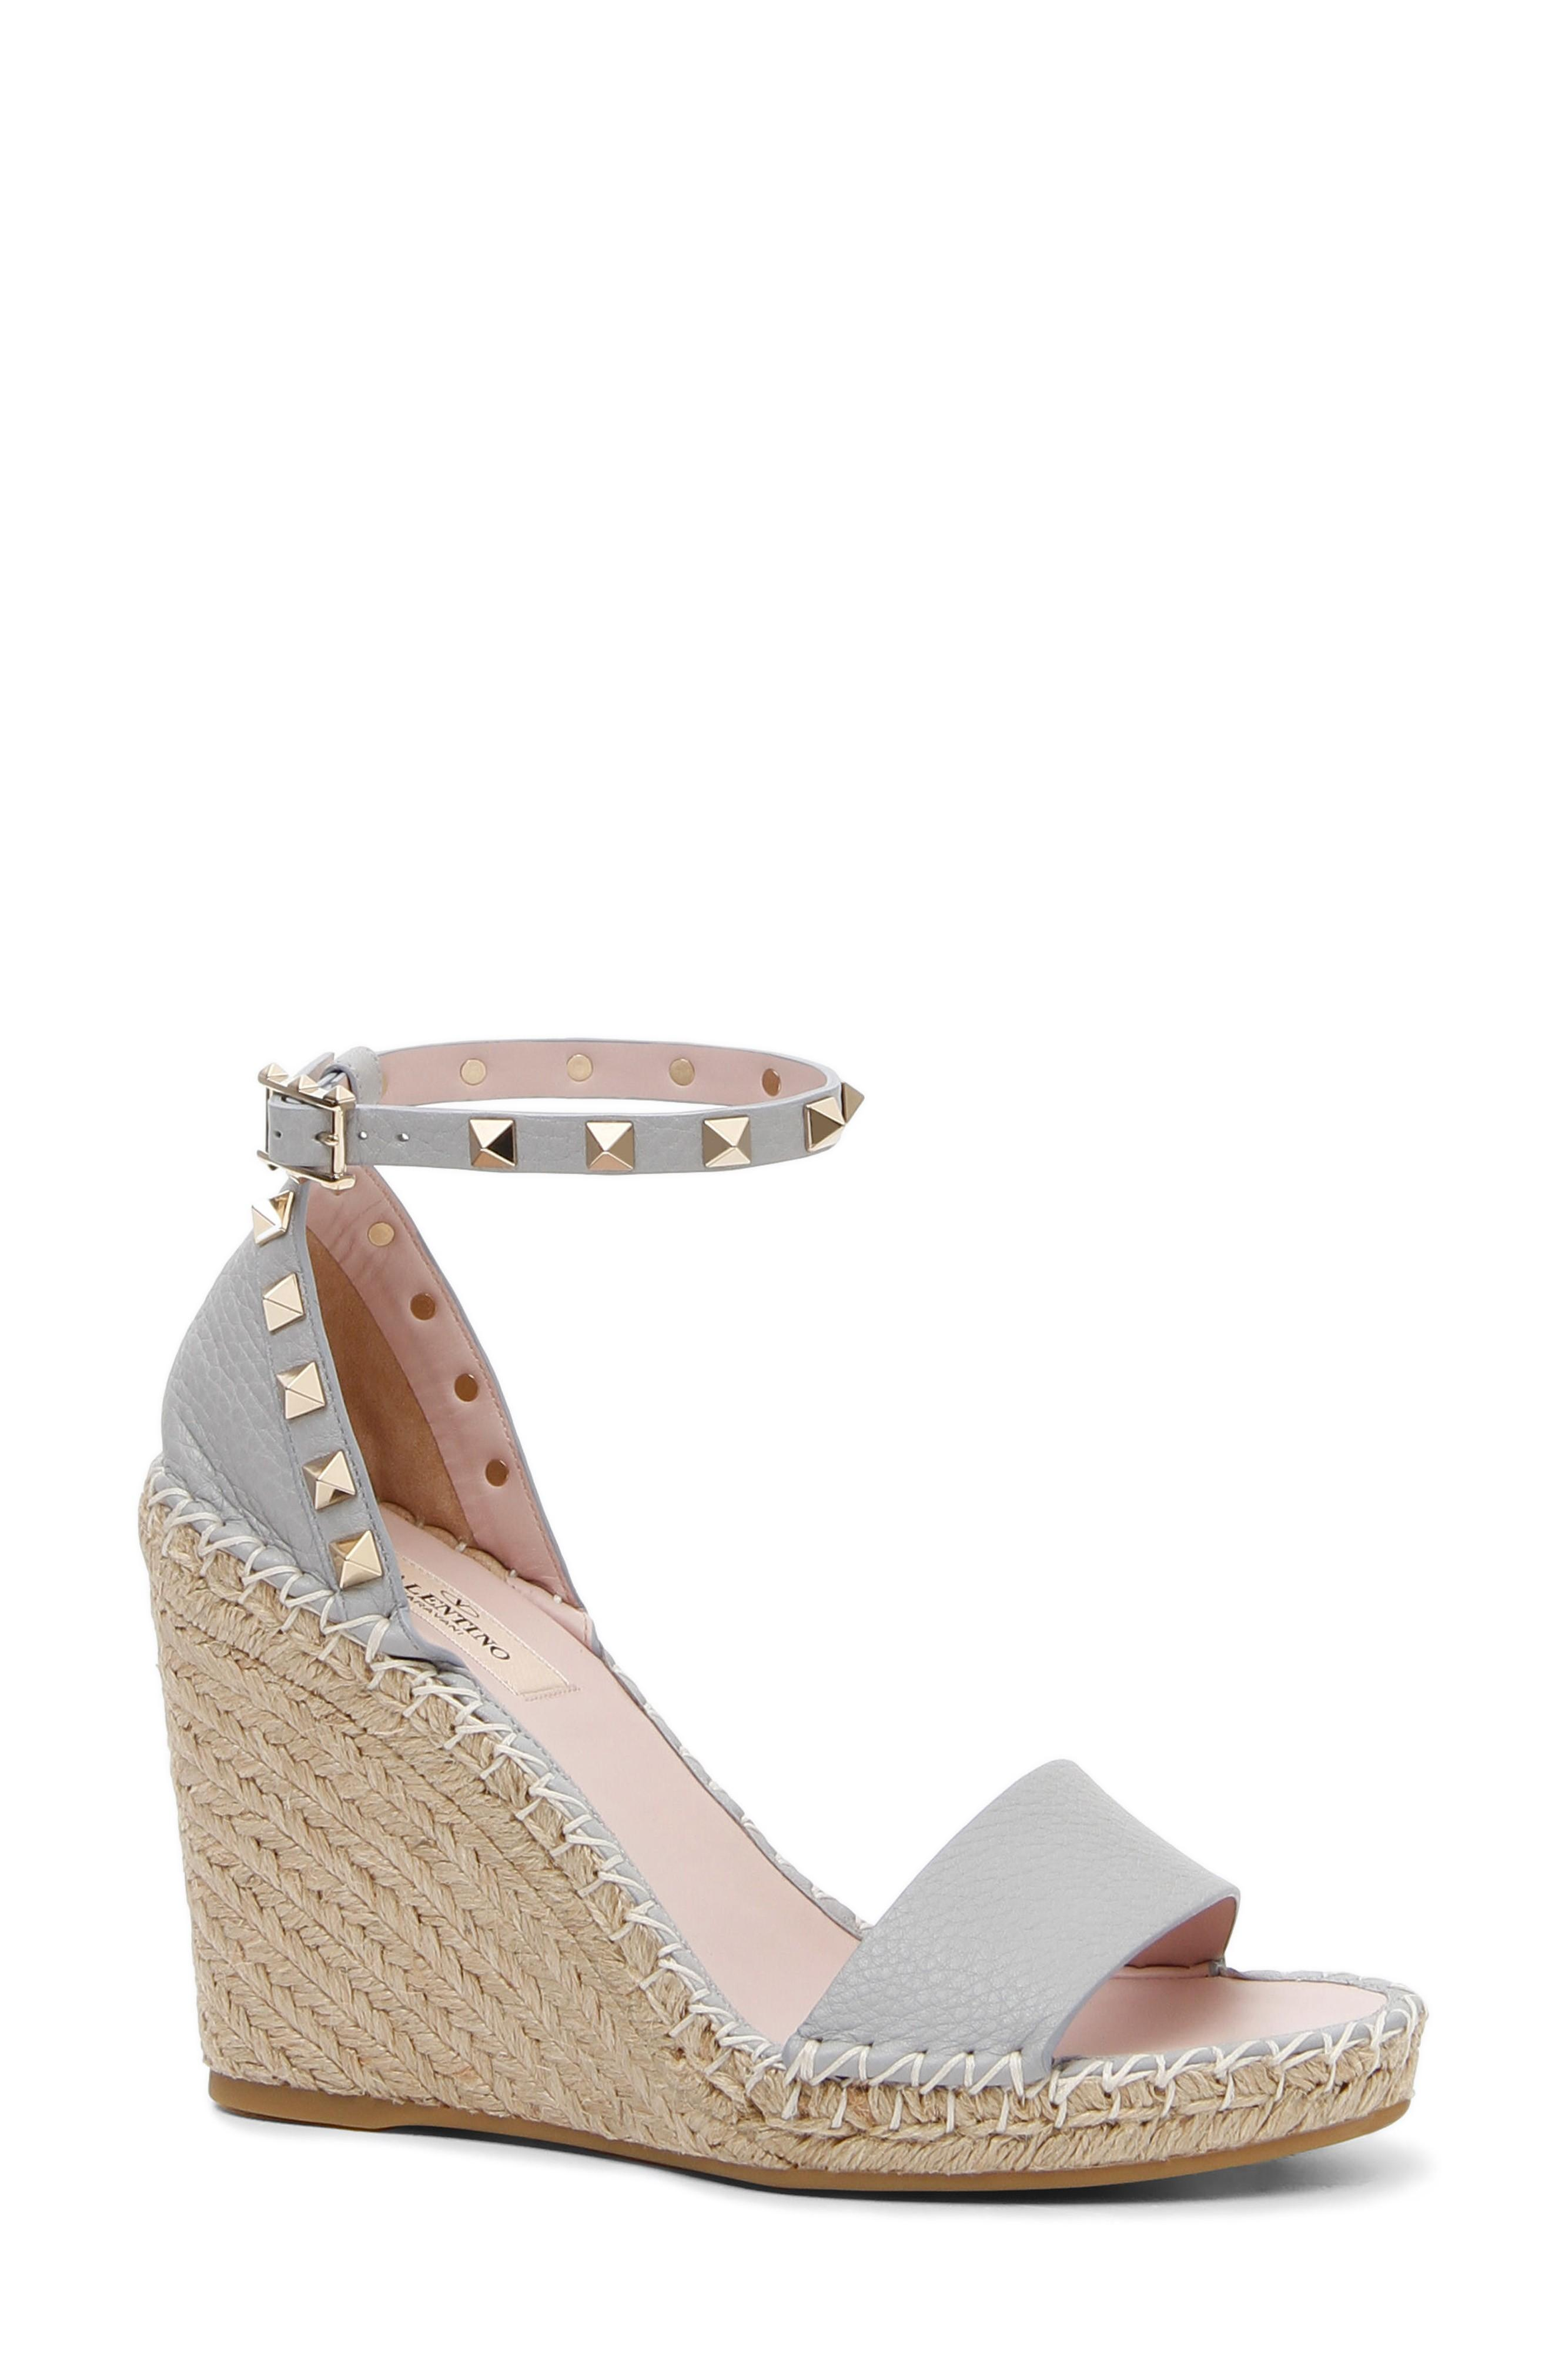 d3aa34477e0 Valentino Grain Calfskin Leather Rockstud Double Wedge Sandal 95Mm ...